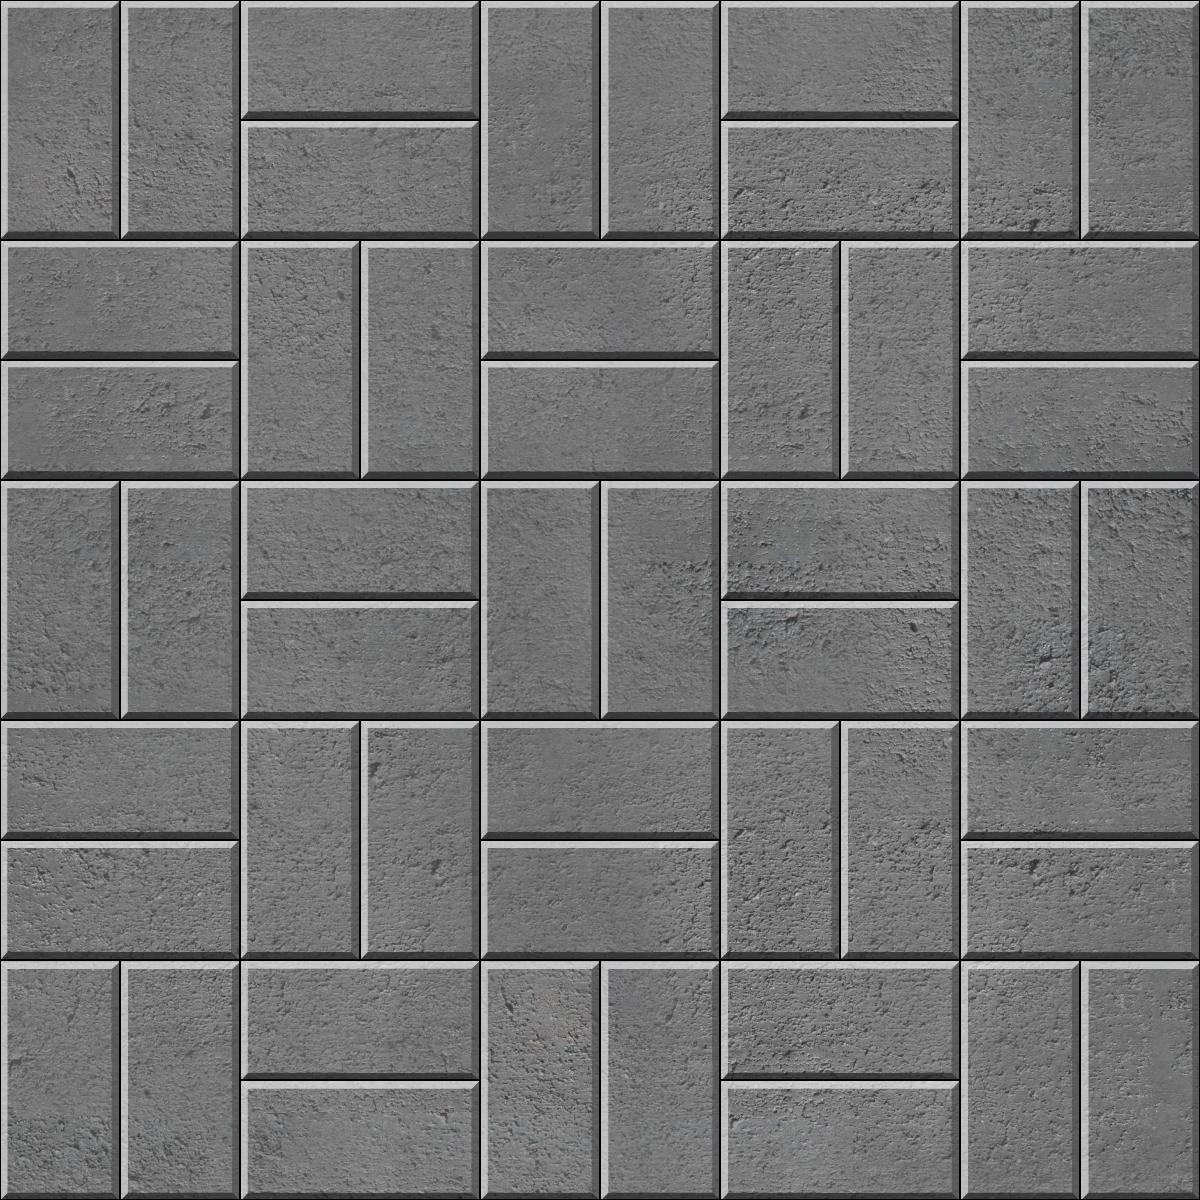 Basketweave brick paver